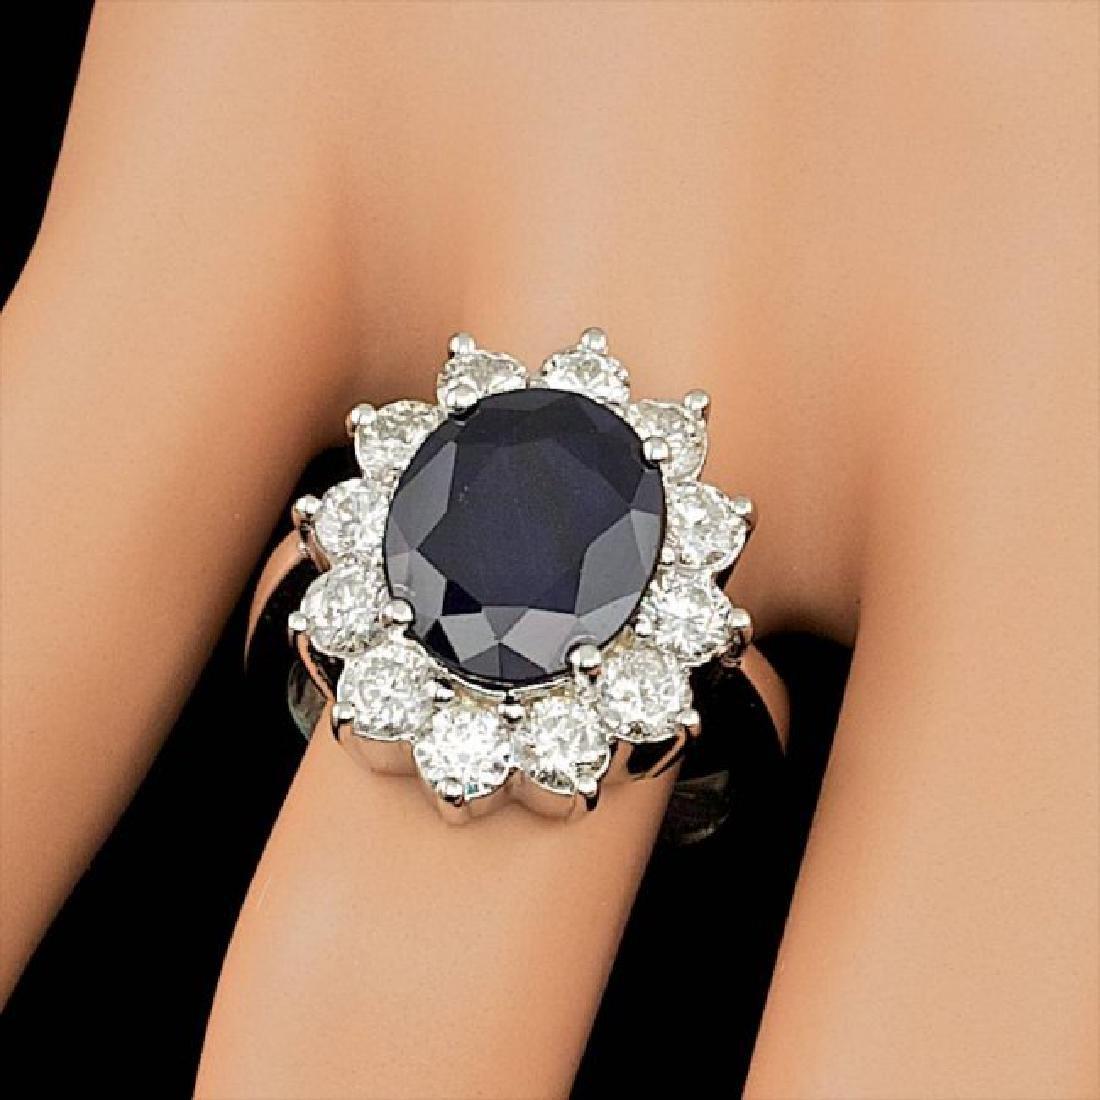 14k Gold 5.00ct Sapphire 2.50ct Diamond Ring - 4